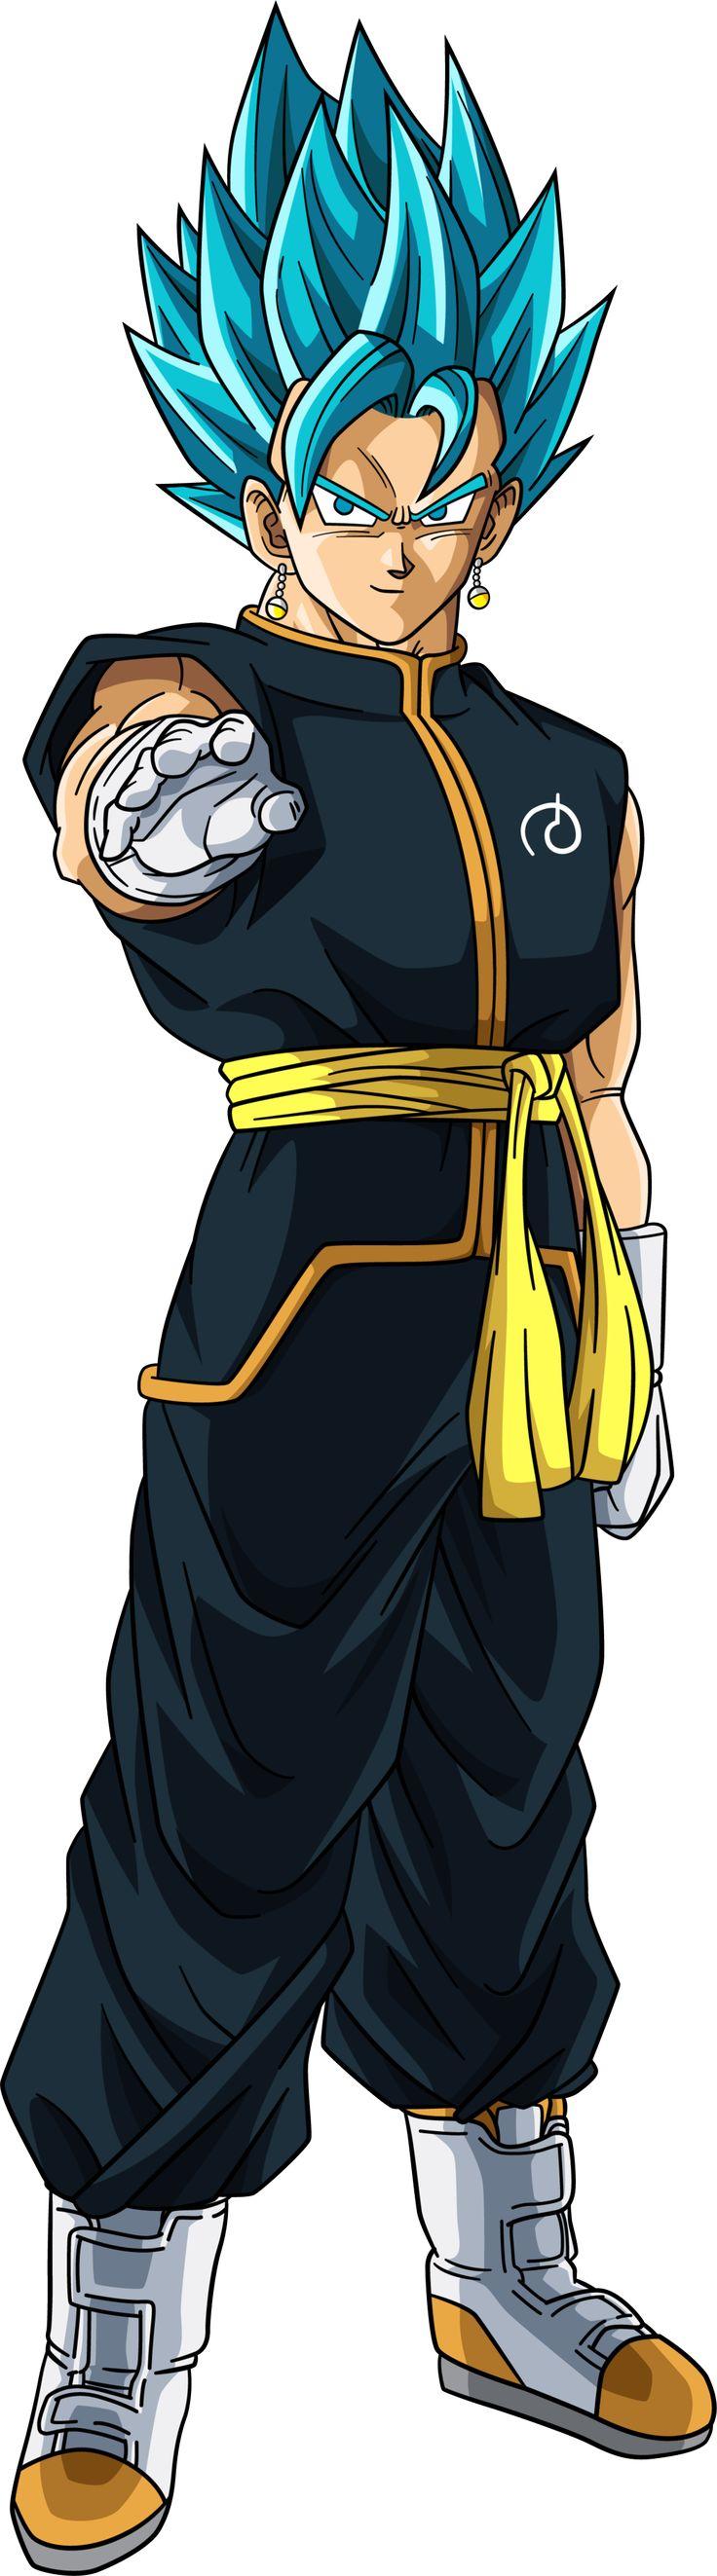 Vegito Fukatsu No F (Super Saiyan Blue) by RighteousAJ on DeviantArt